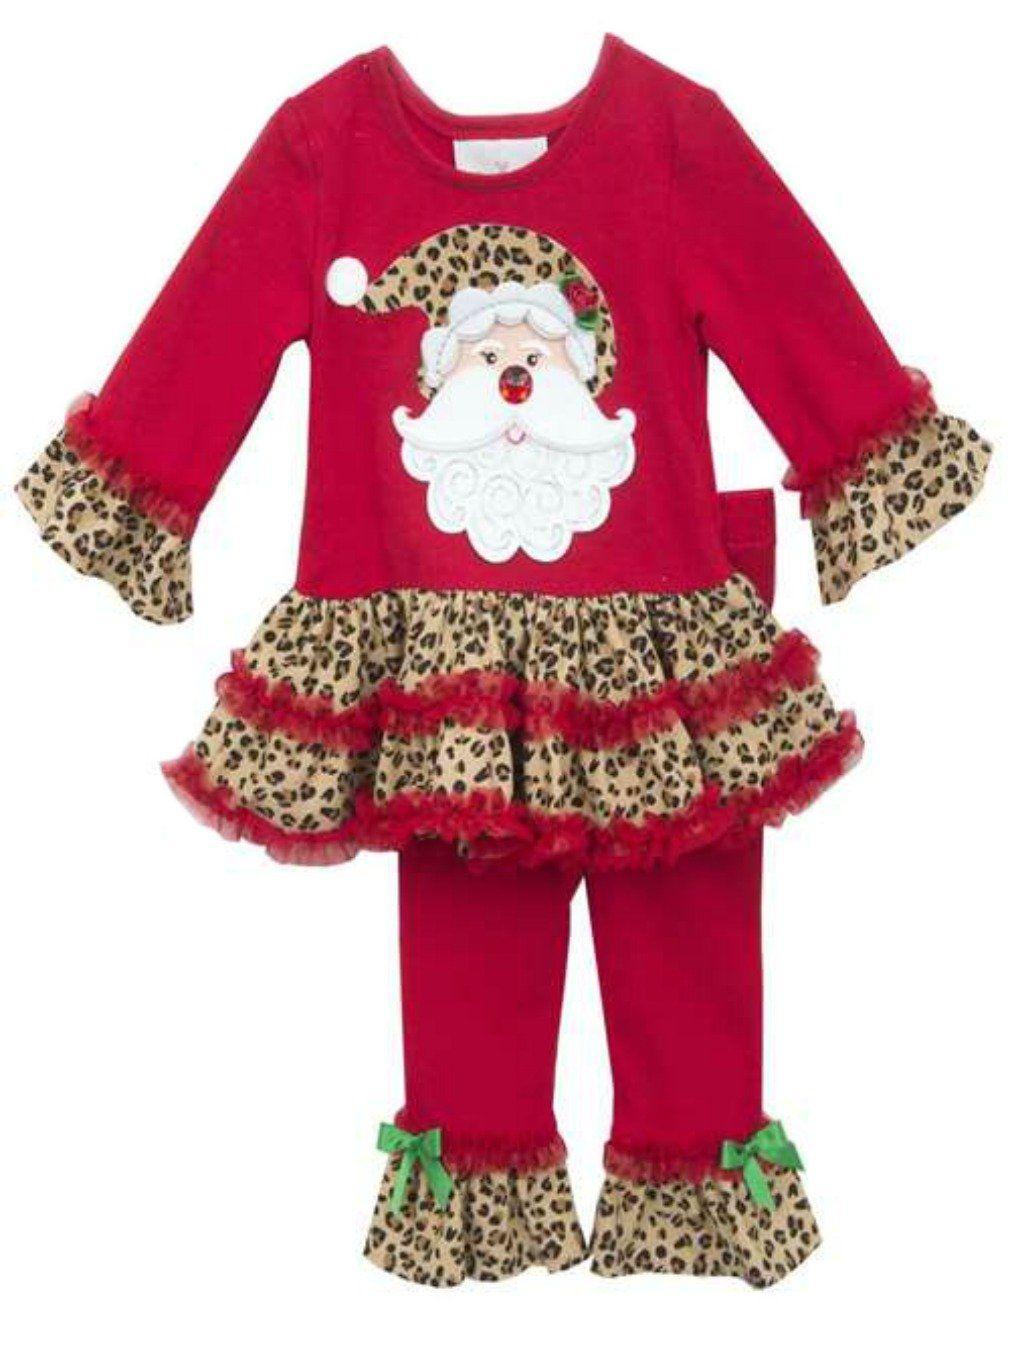 40994894c78f9 Rare Editions Big Girls Leopard Santa Pant Set 7. Fabulous leopard trimmed  ruffle tunic and